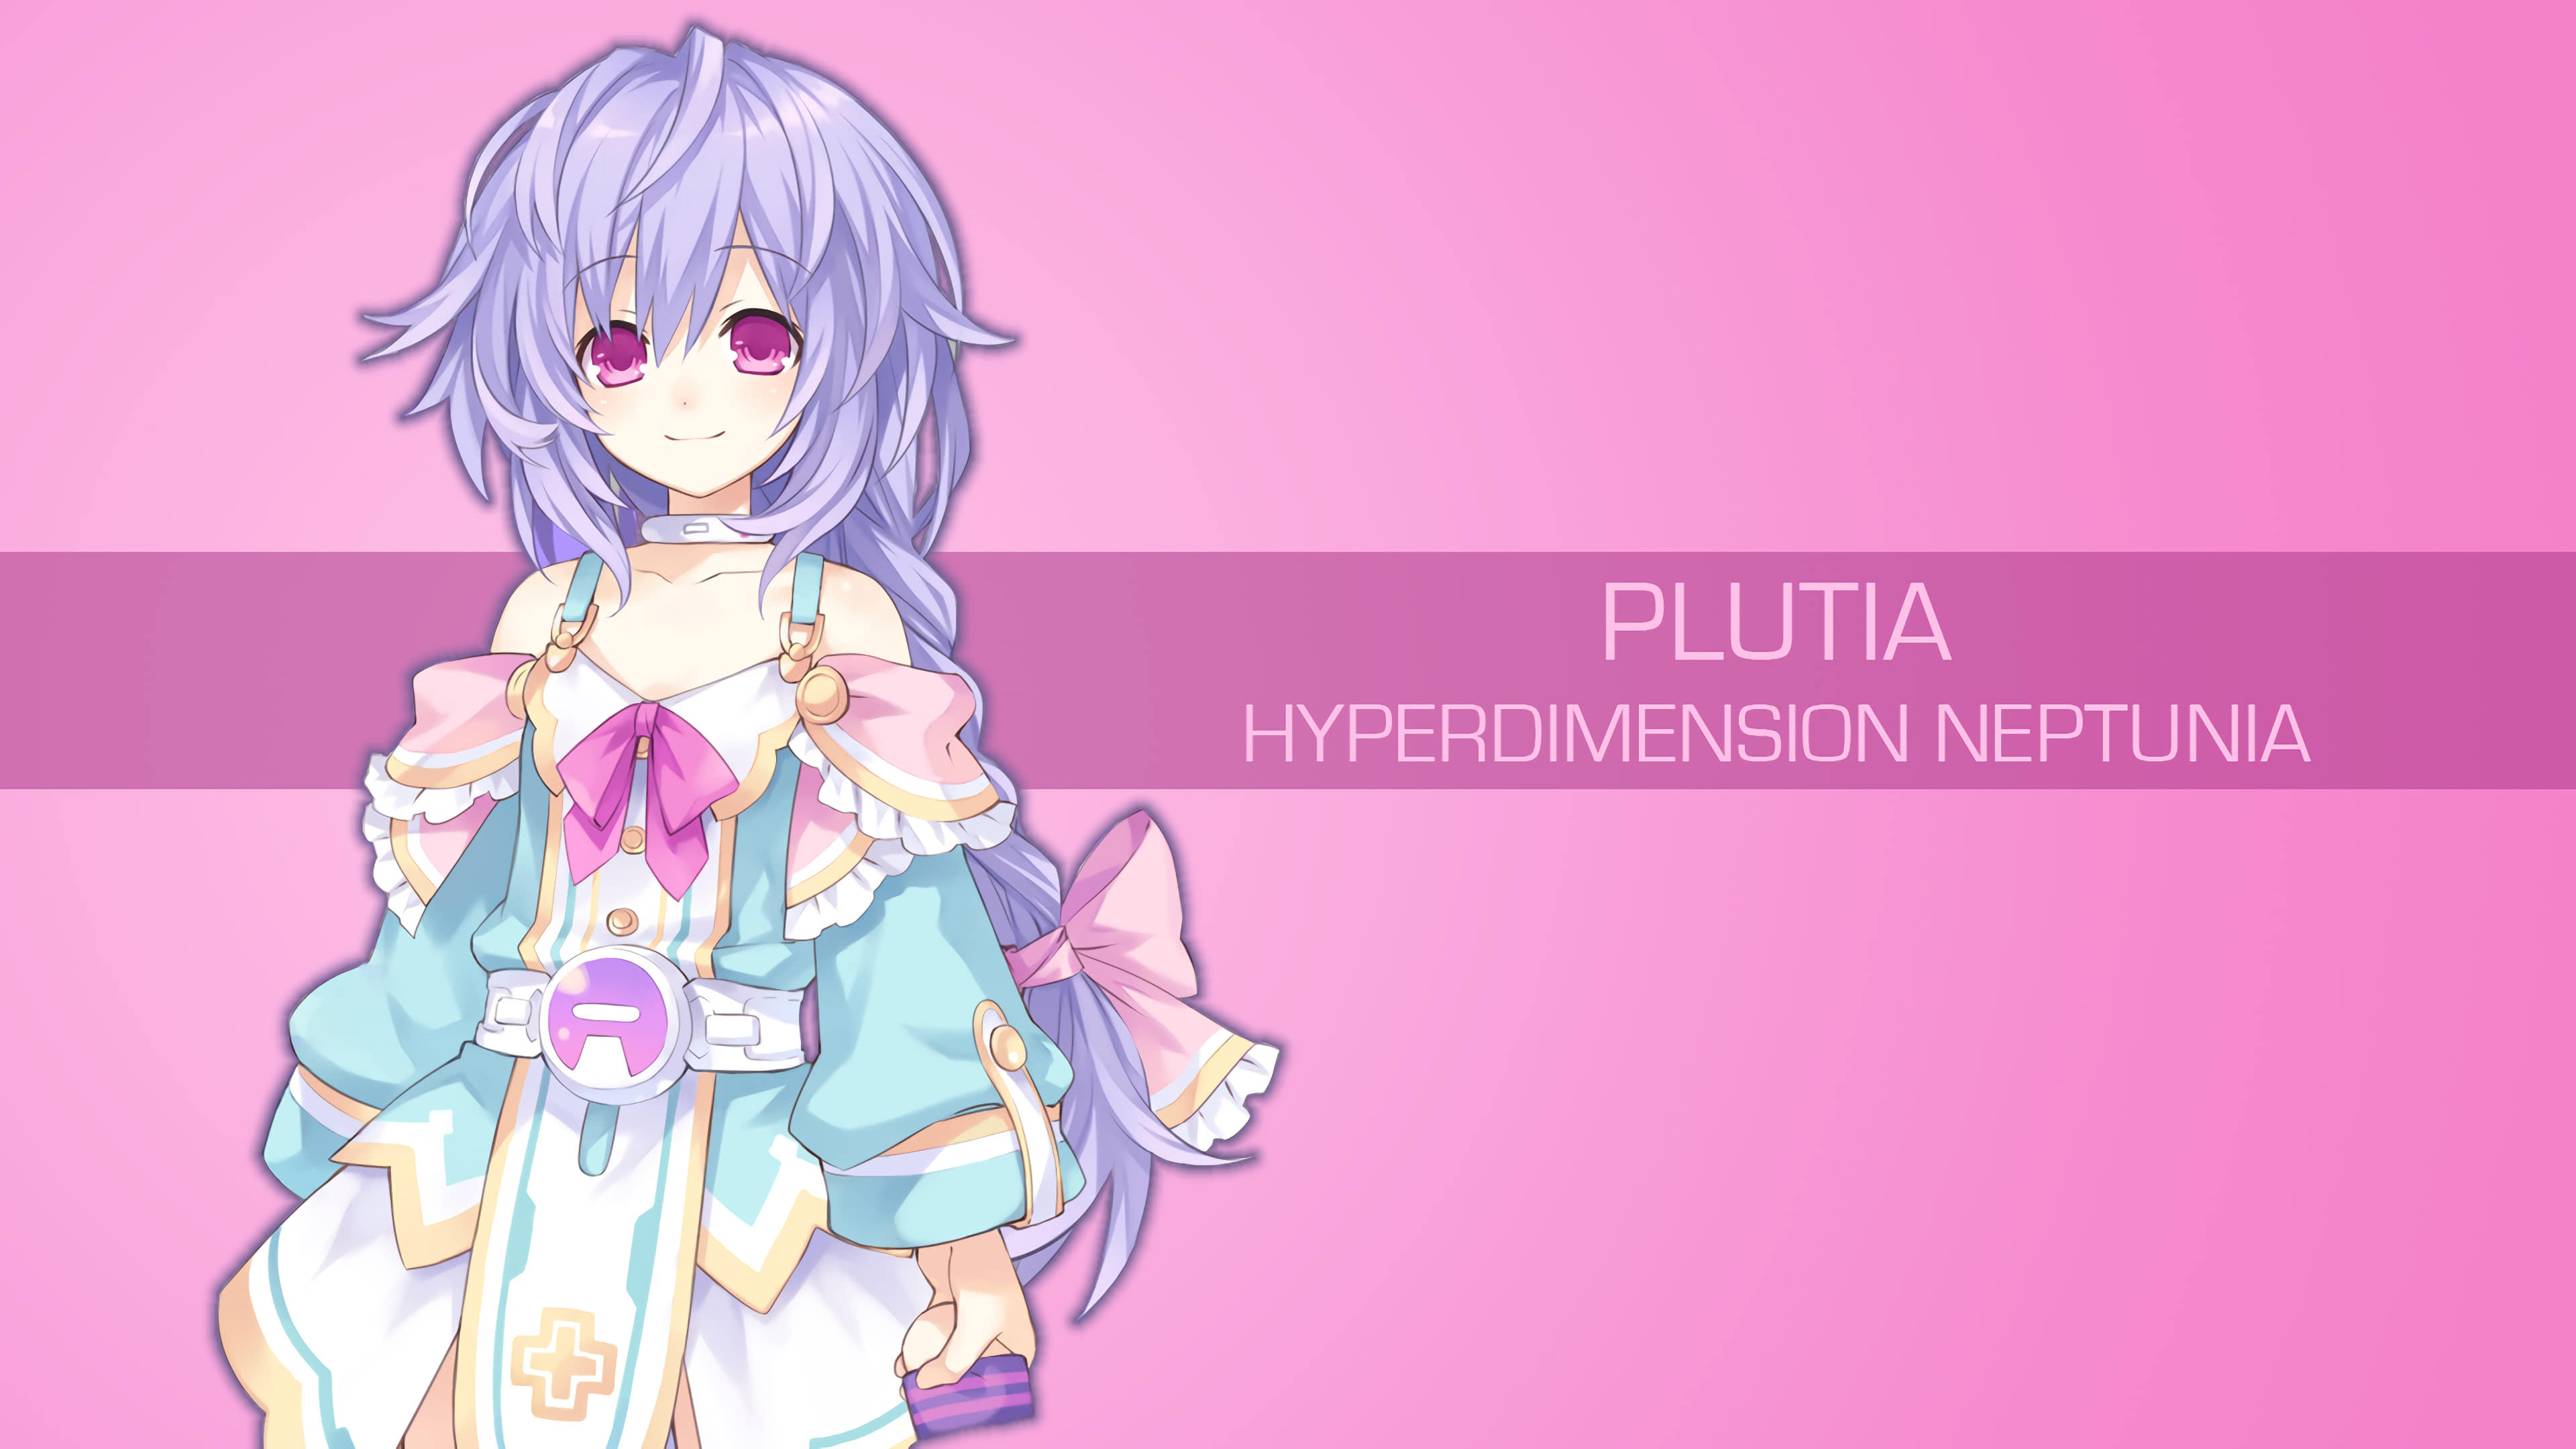 Plutia Hyperdimension Neptunia UHD 4K Wallpaper   Pixelz